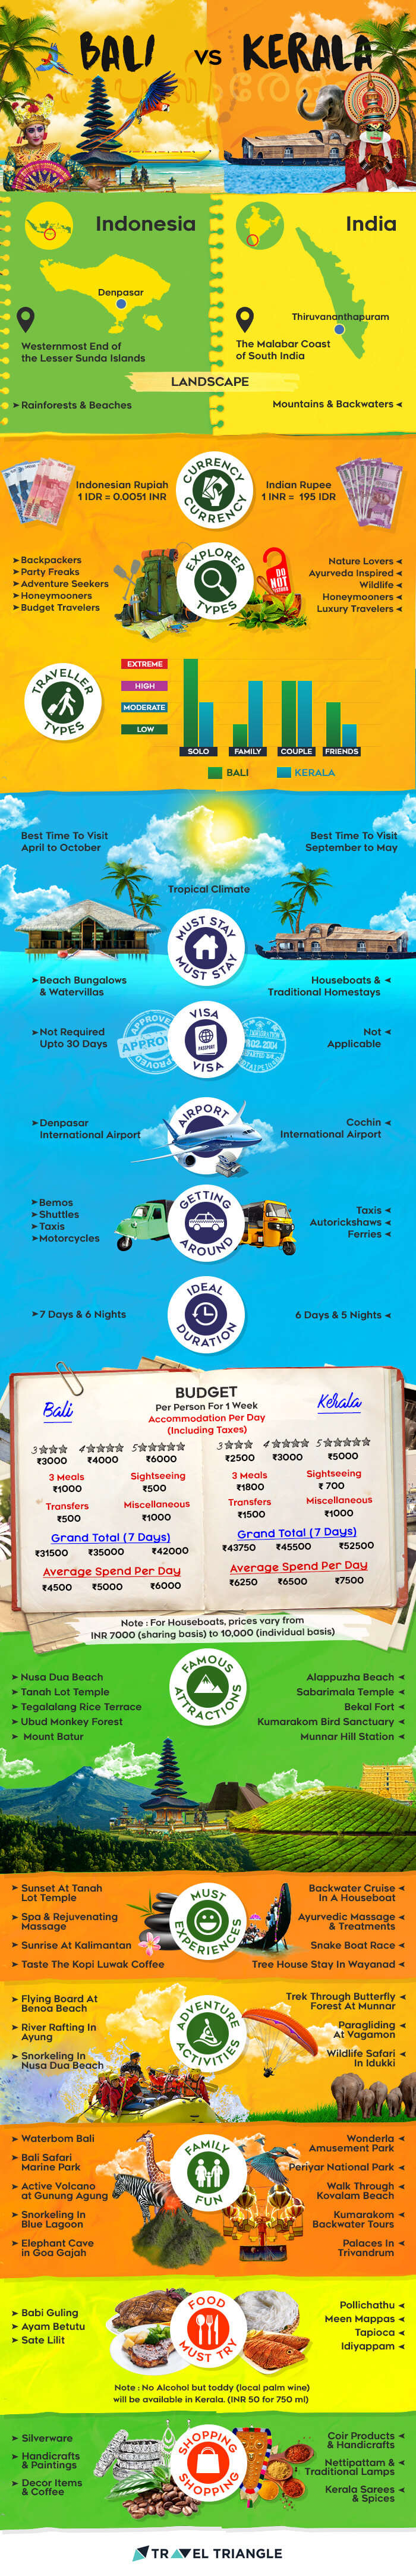 Bali Vs Kerala Infographic